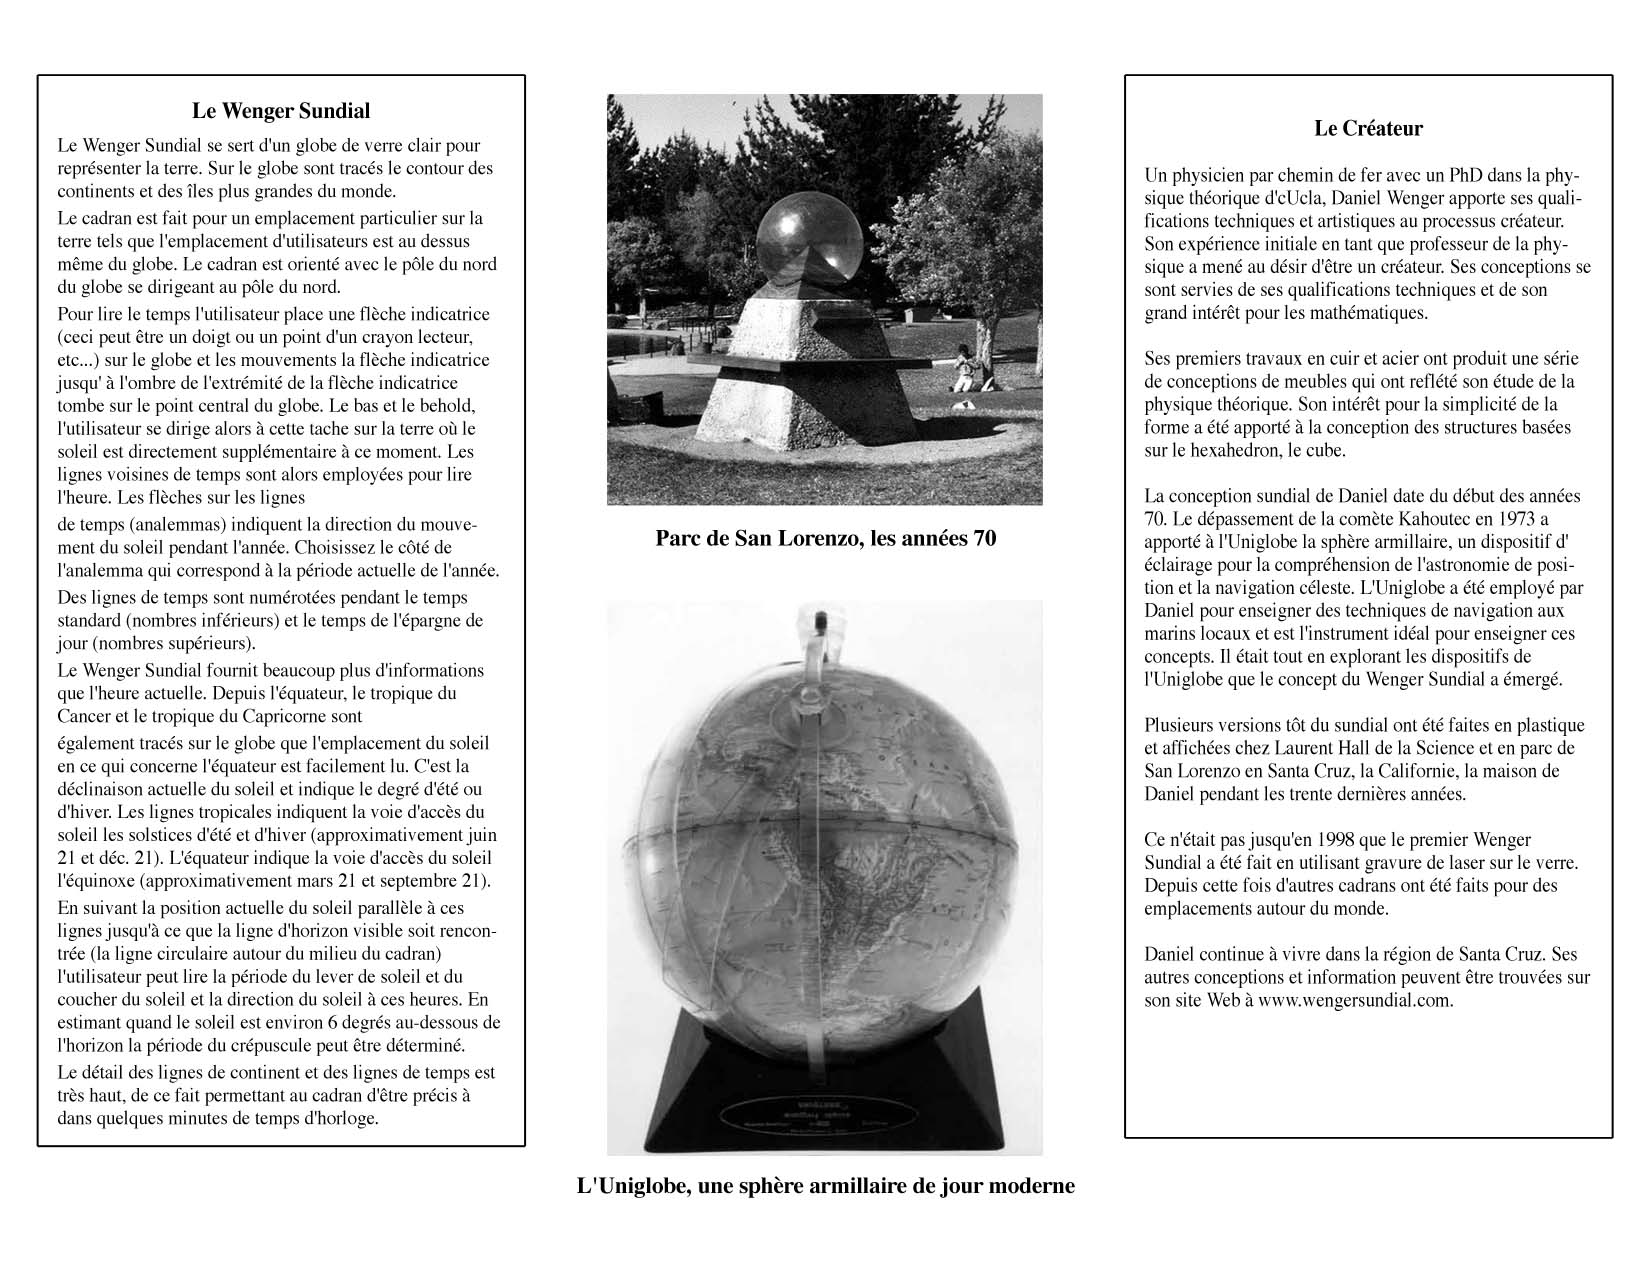 Wenger Sundial Brochure in French